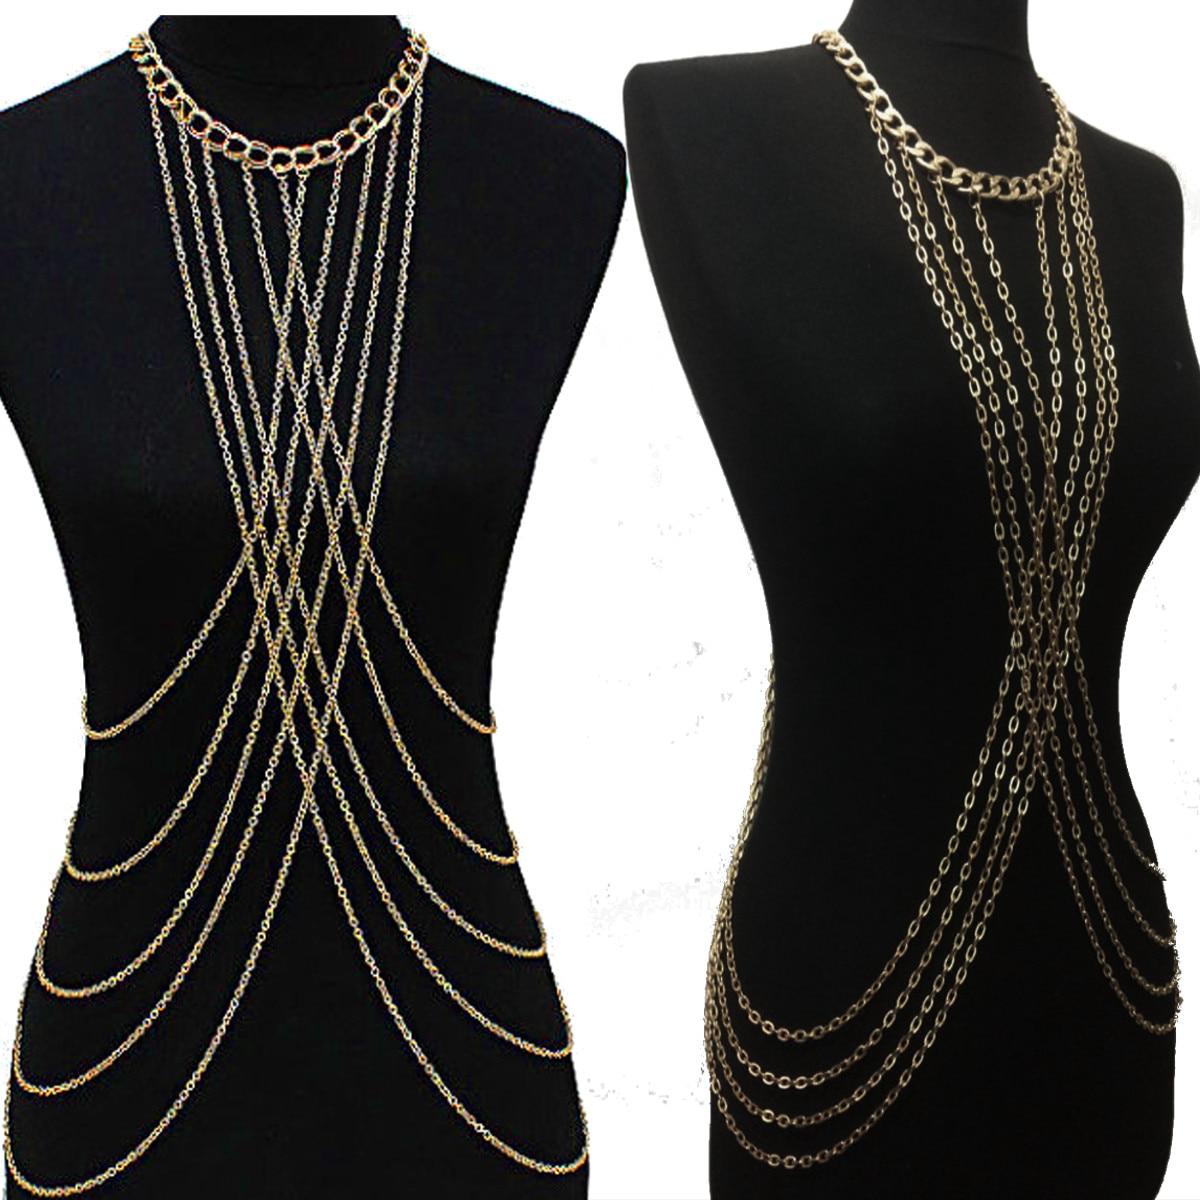 Sexy Beach Crossover Tassel Body Waist Chain For Women Metal Fringe Cross-tie Shoulder Bikini Harness Belt Chain Waistband NEW chain